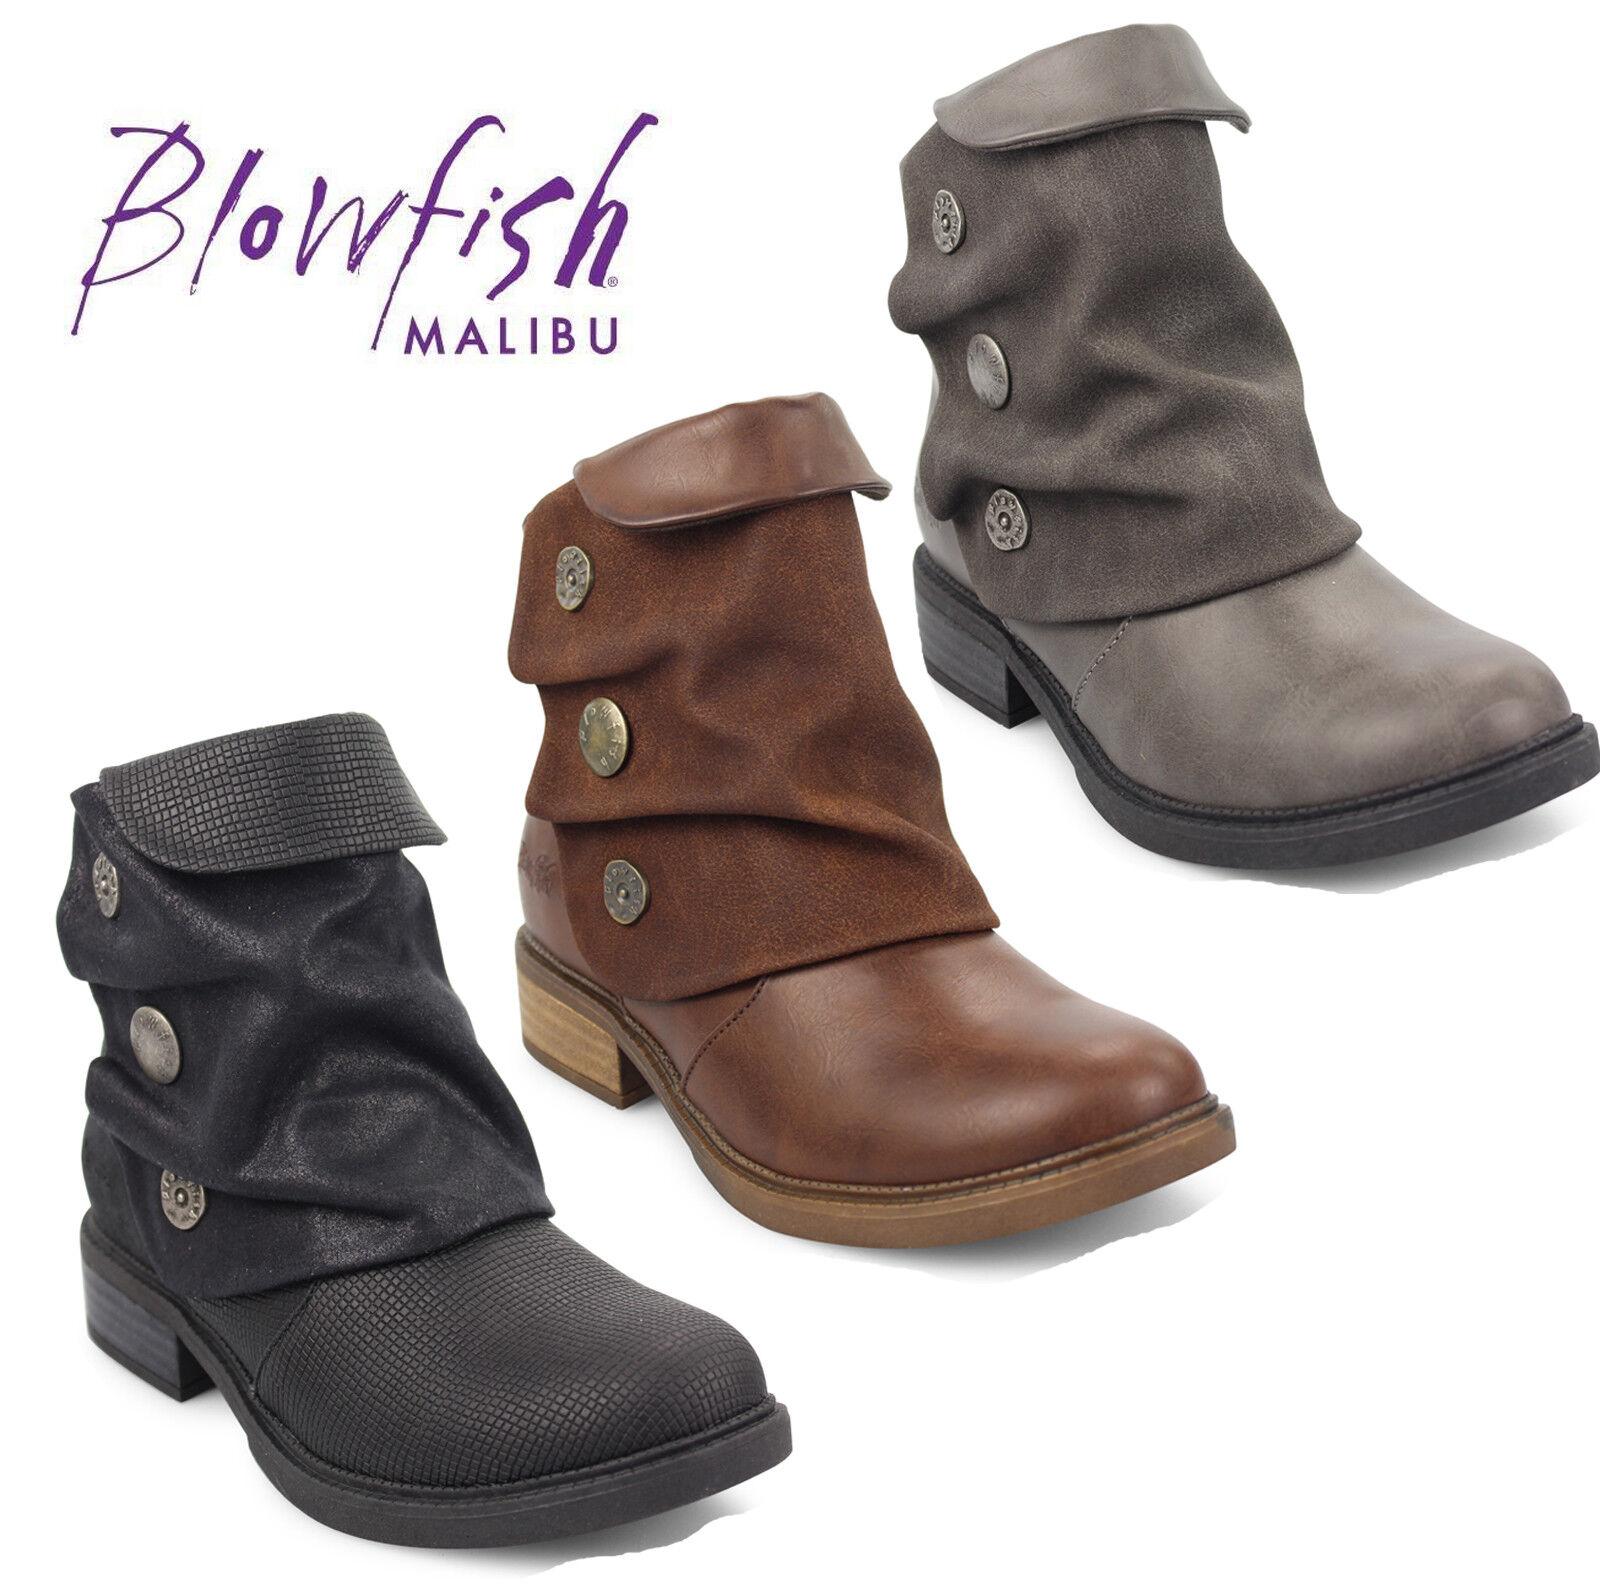 Blowfish Malibu Ladies Vynn Ankle Boots Button Detail Zip Up Fashion shoes UK3-8